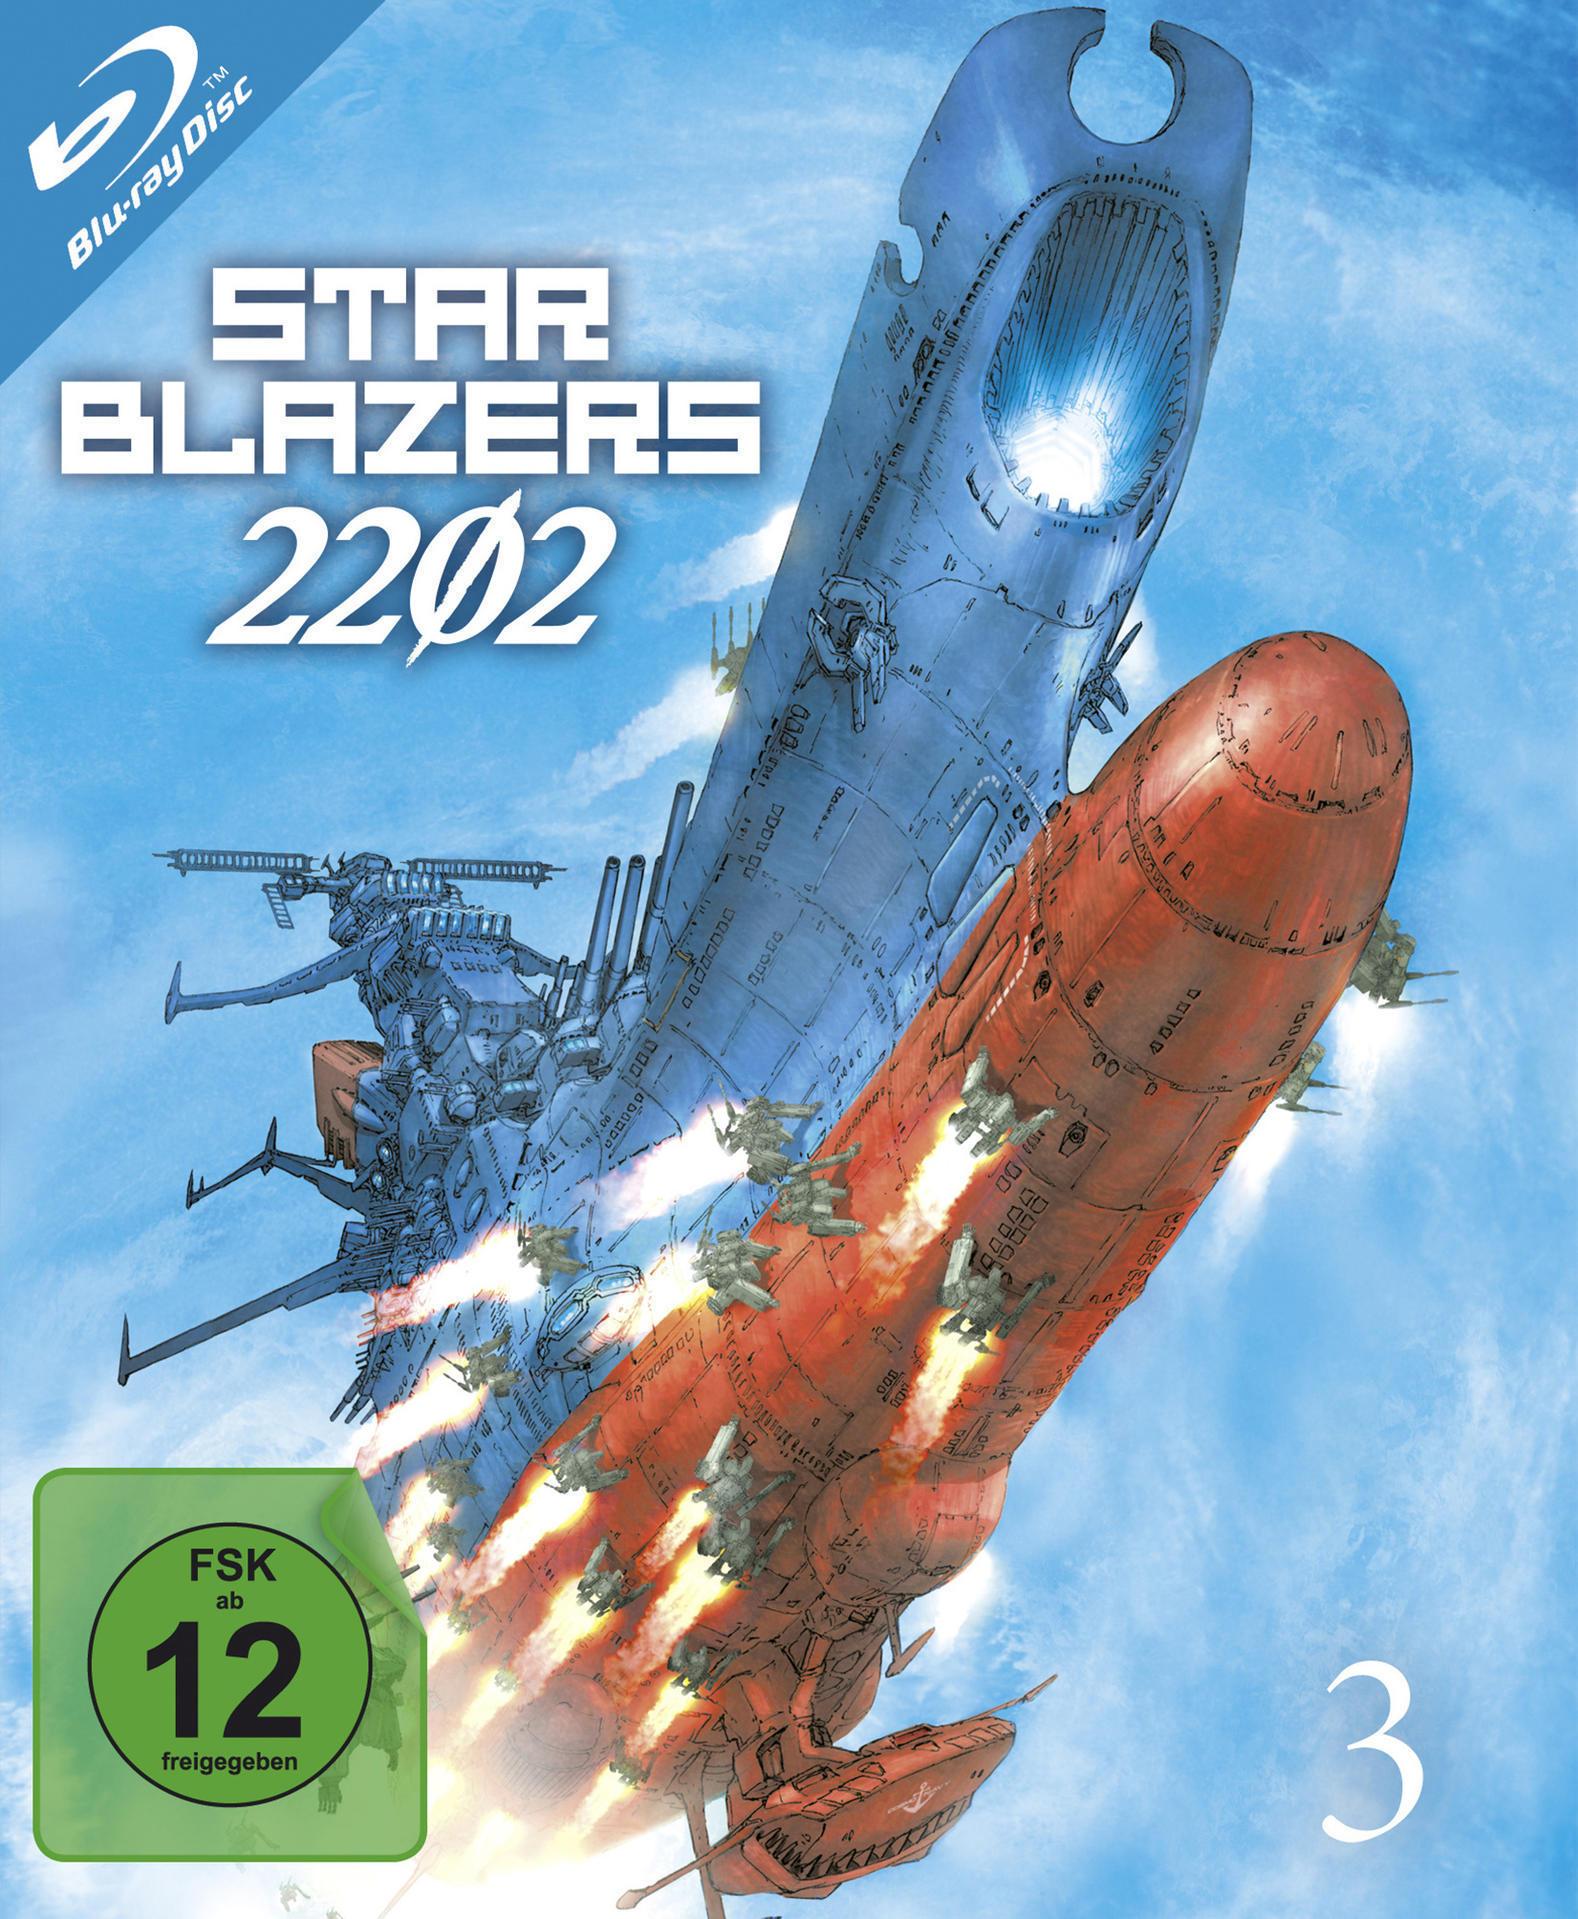 Star Blazers 2202 - Space Battleship Yamato - Vol.3 (BLU-RAY) für 41,96 Euro